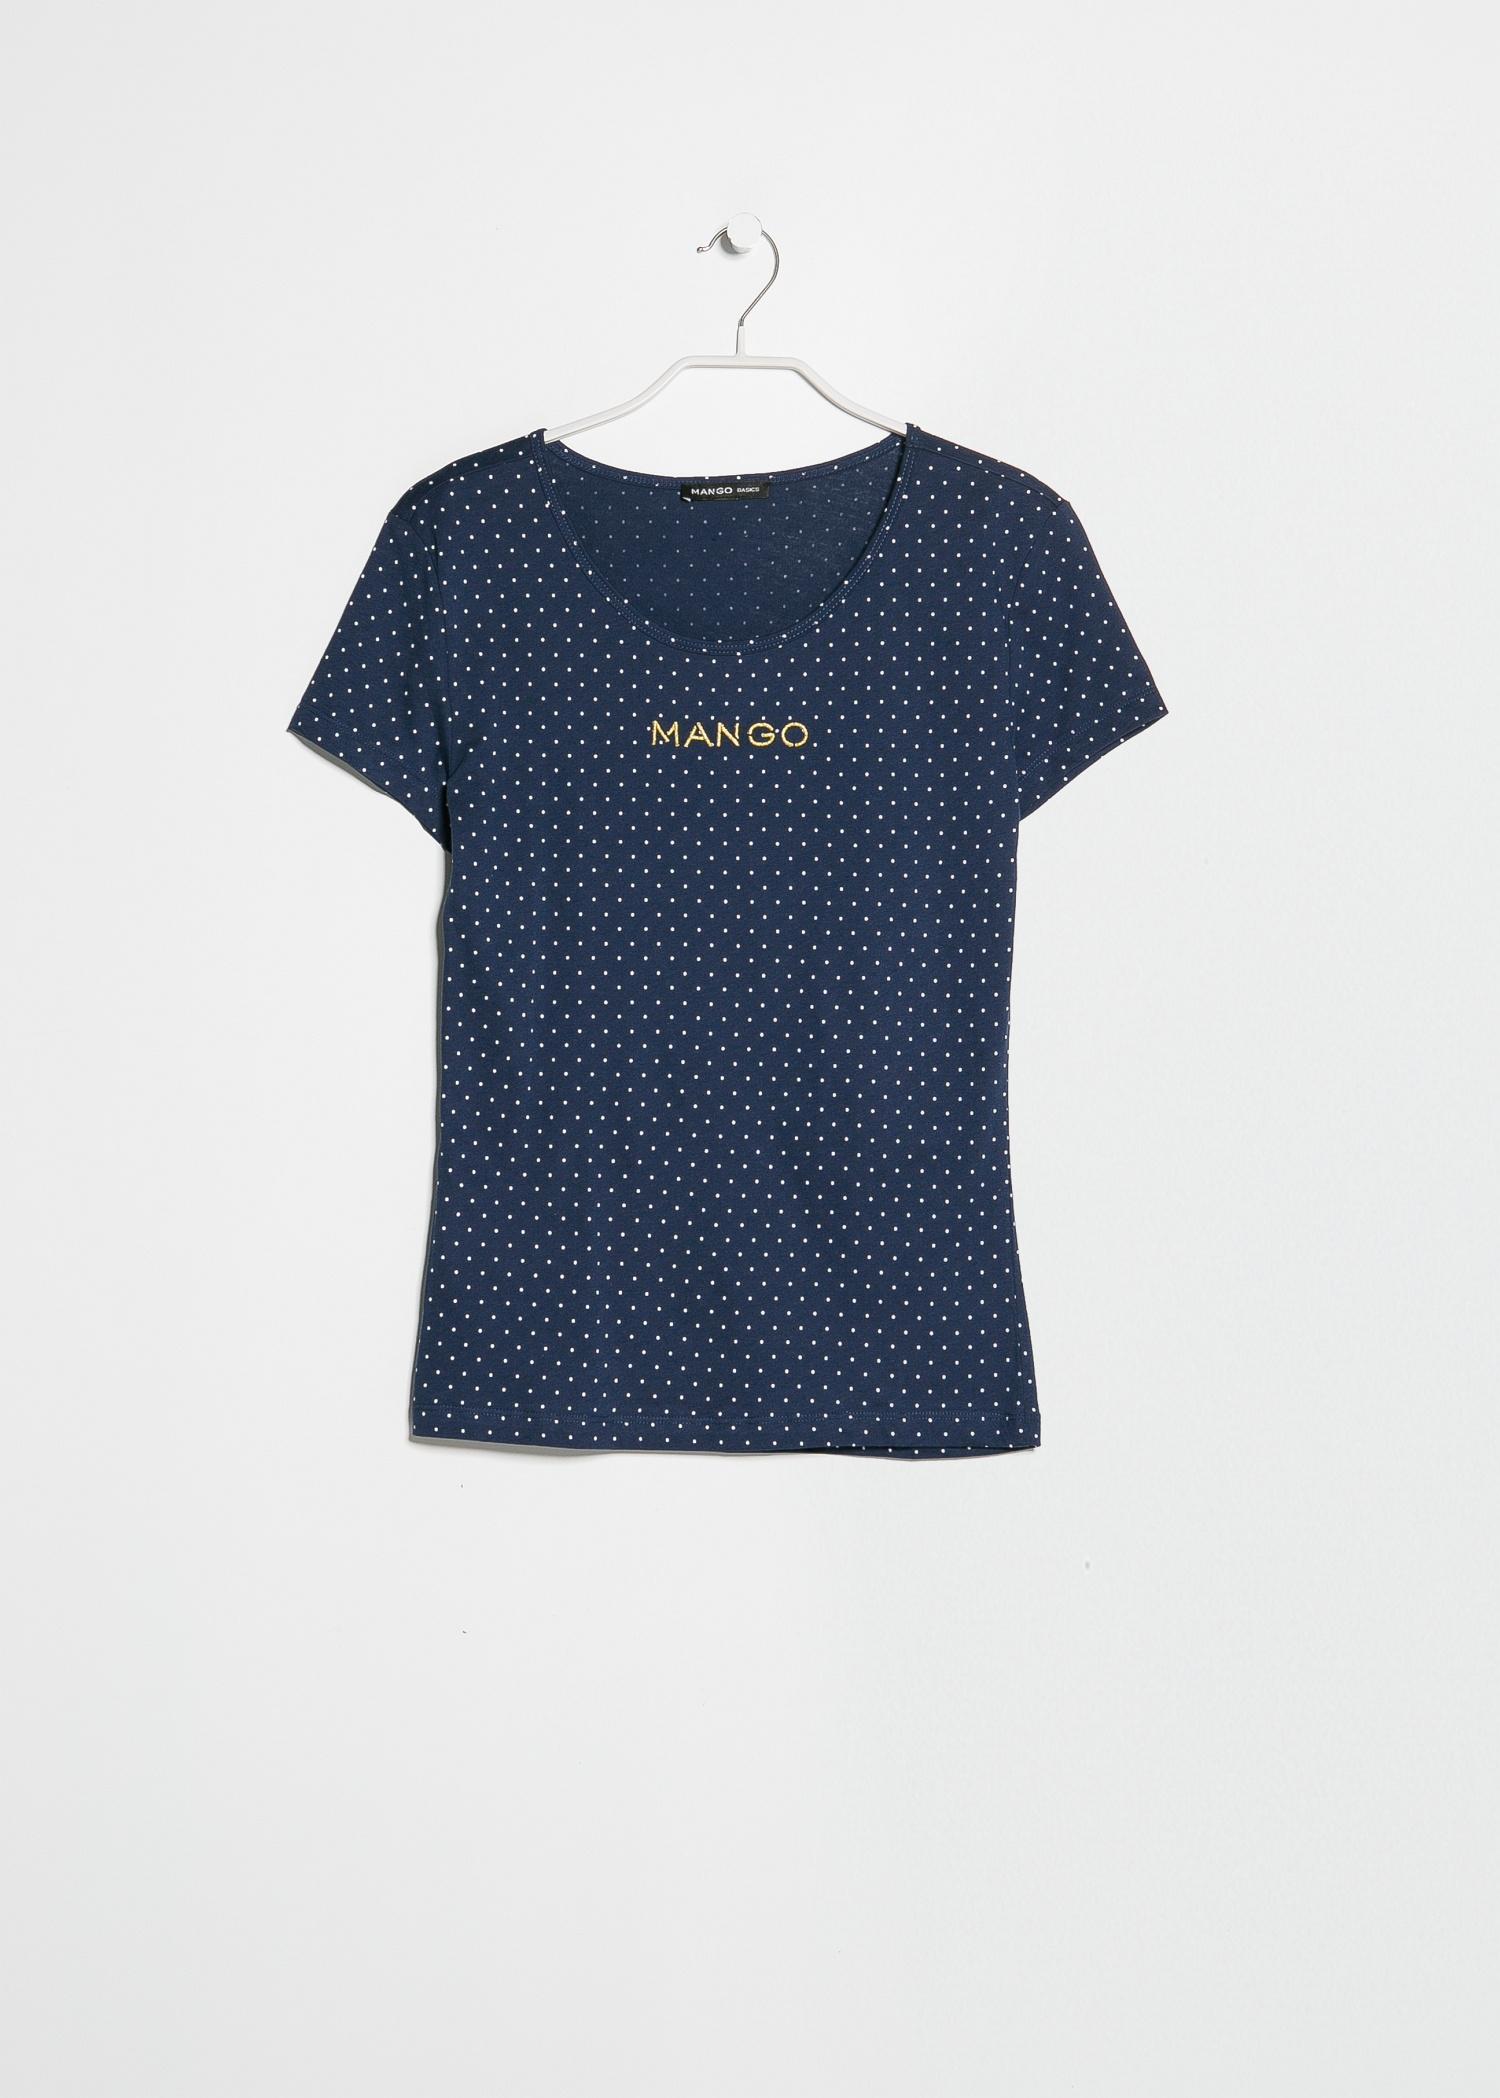 Lyst mango logo polkadot tshirt in blue for men for Logo t shirt dress